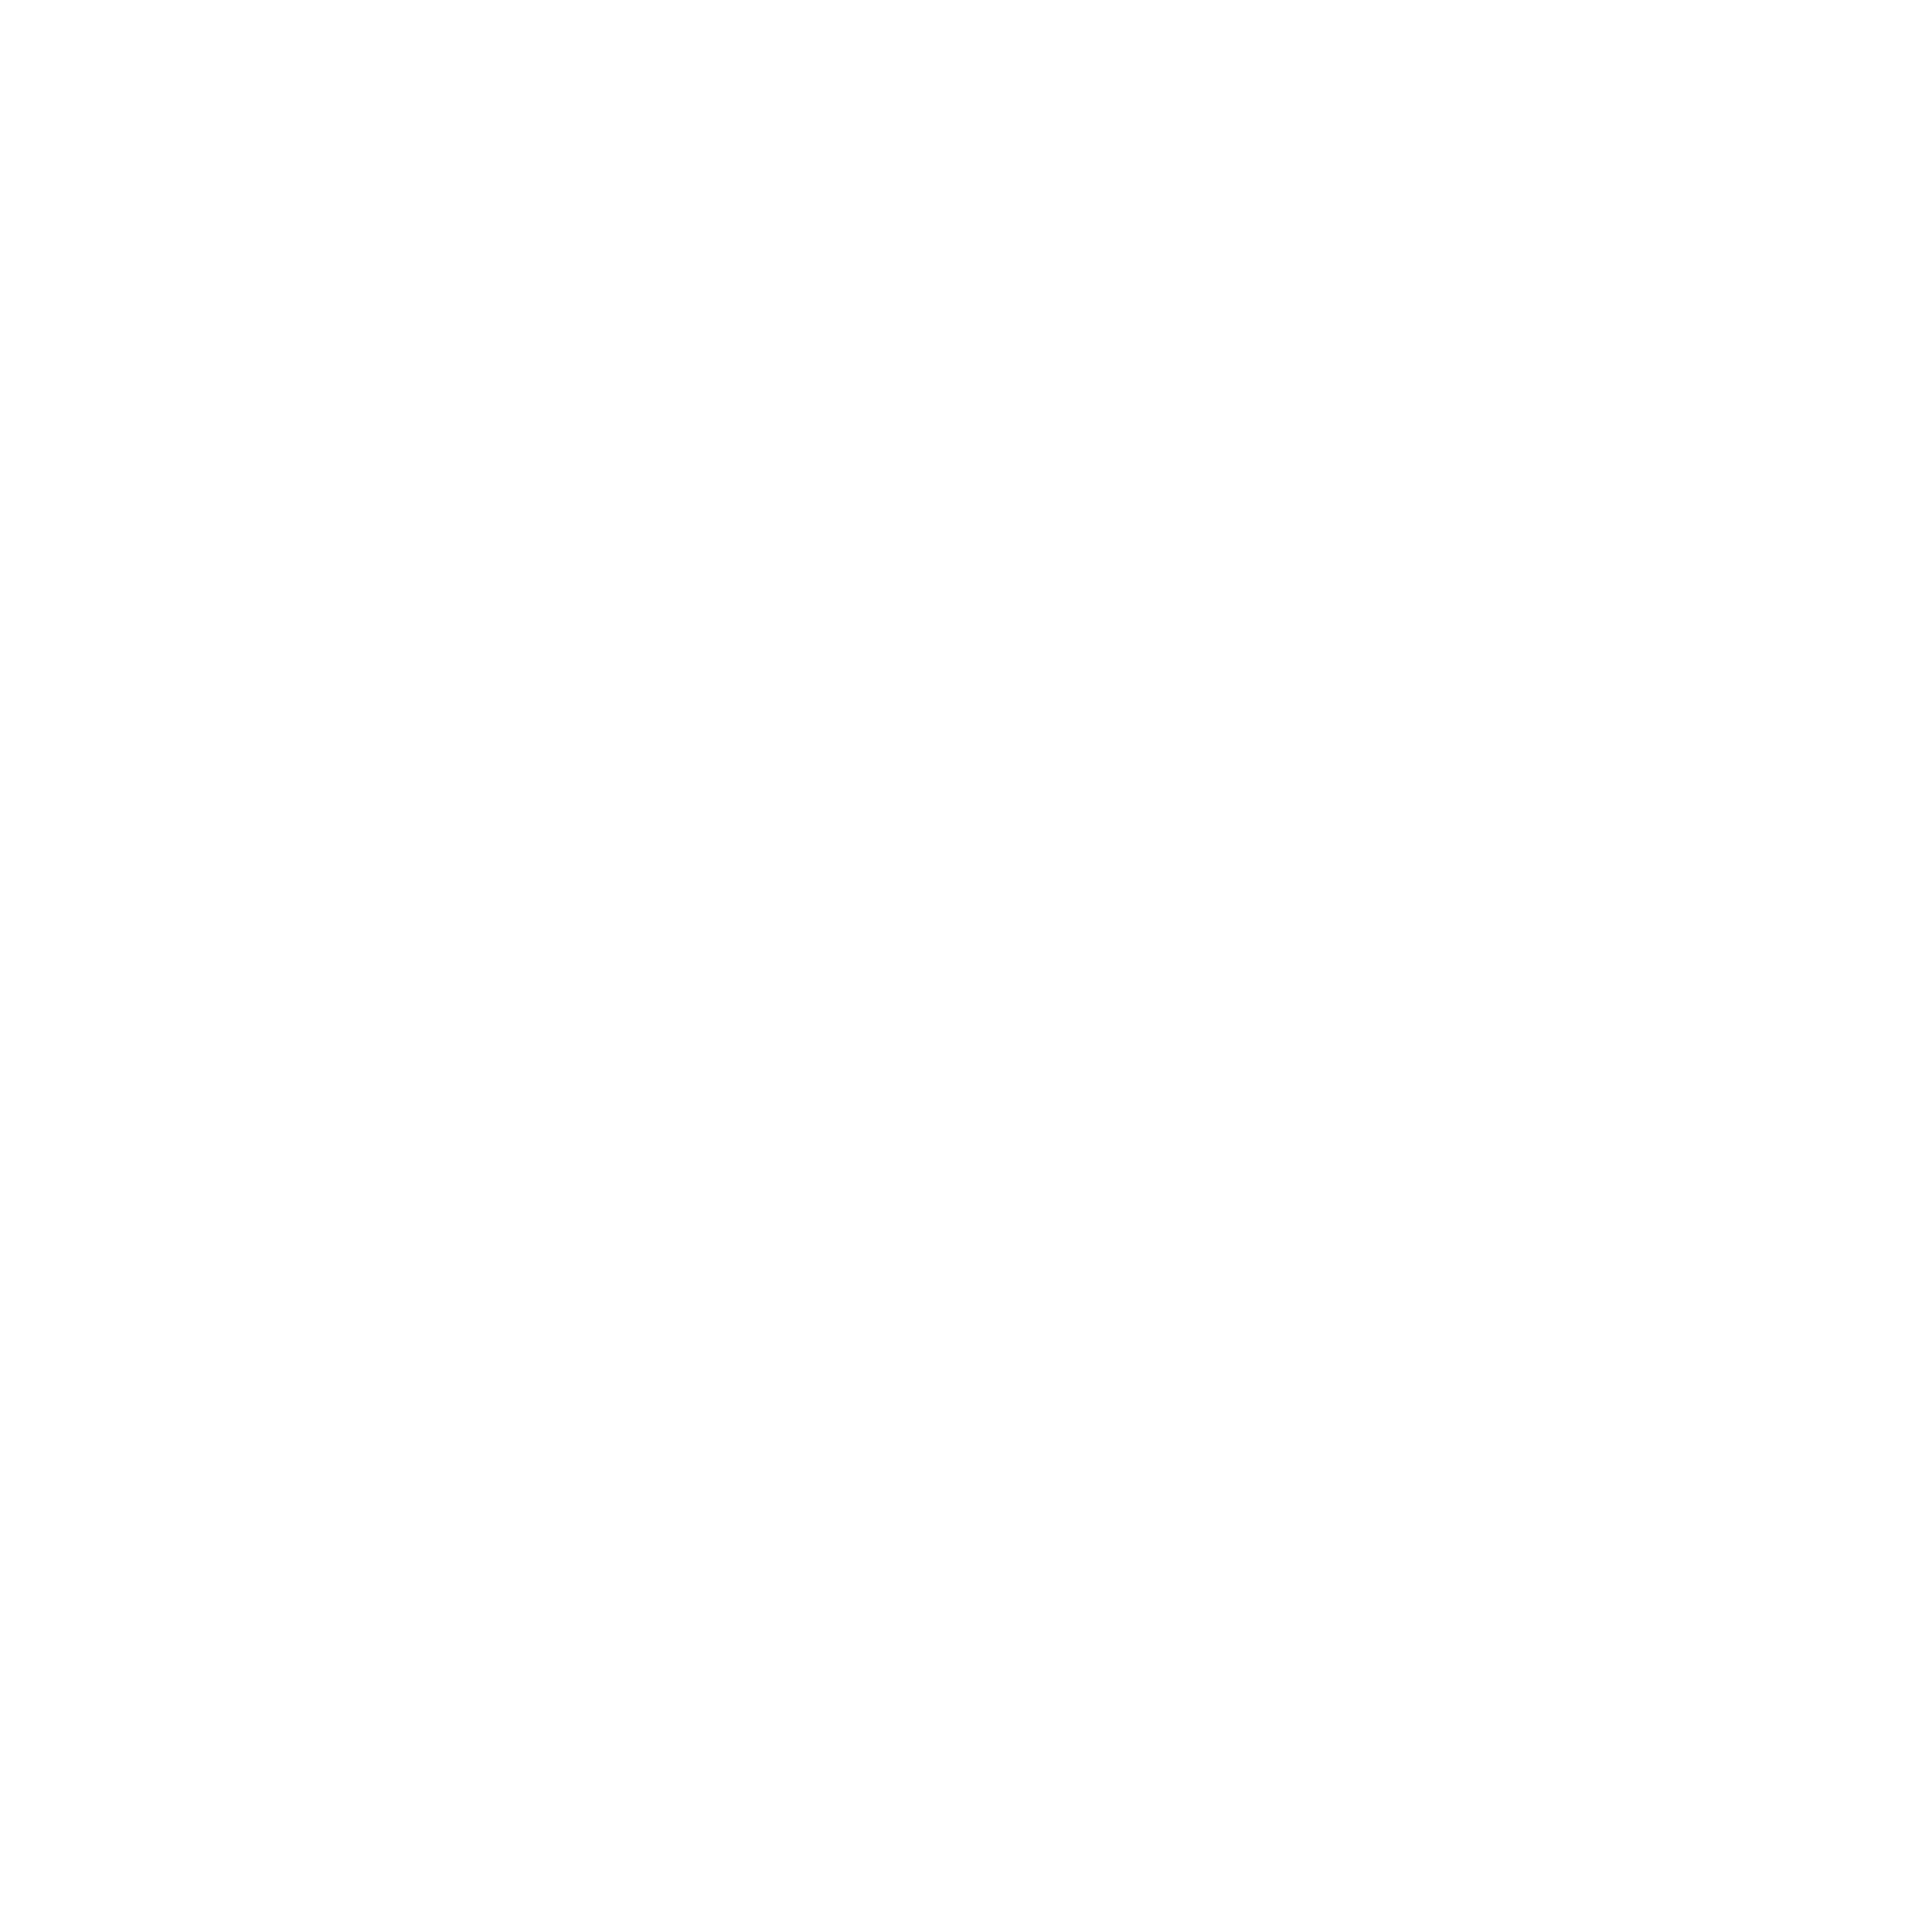 Linkedinlogga